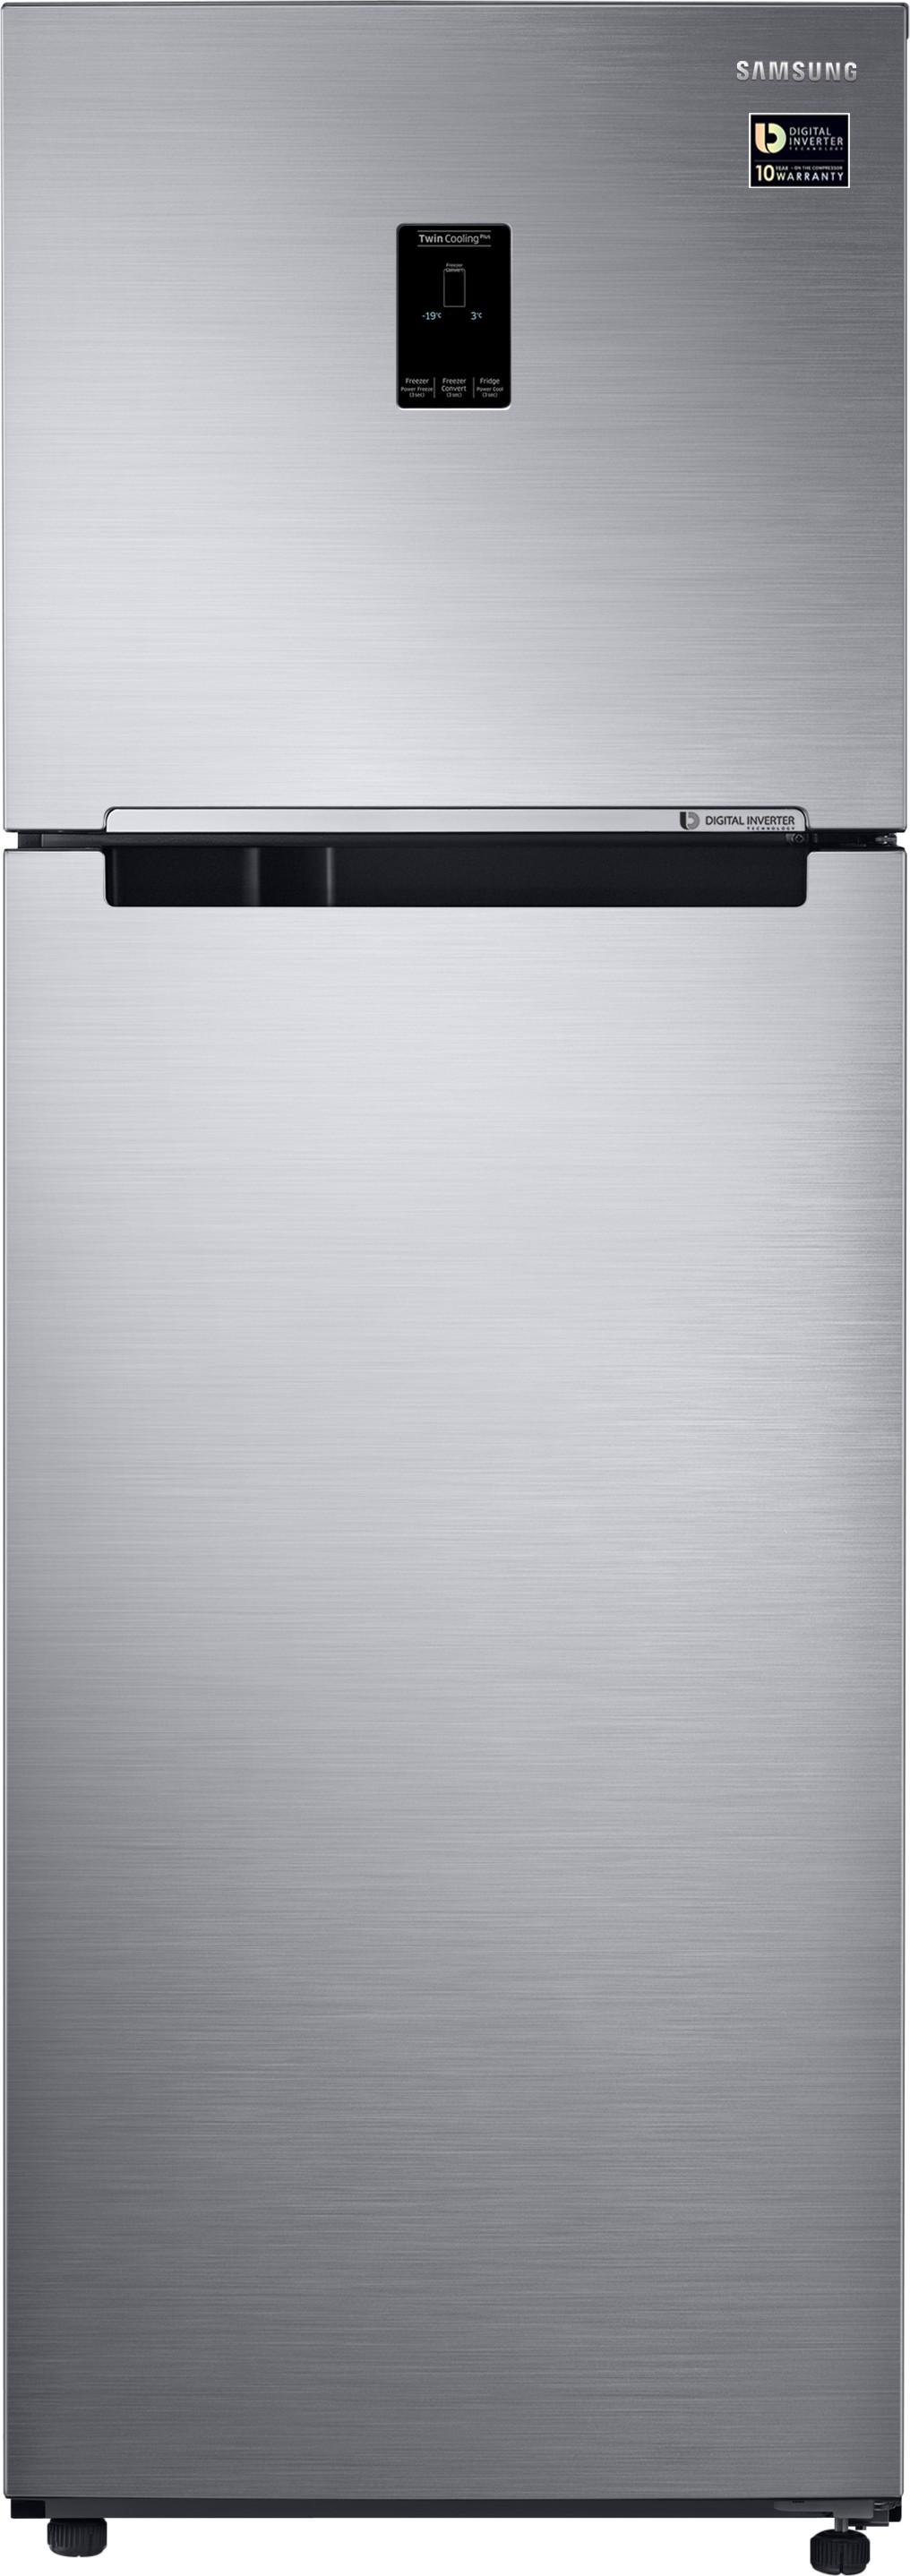 SAMSUNG 345 L Frost Free Double Door Refrigerator(RT37M5538S9/TL, Refined Inox, 2017) (Samsung) Tamil Nadu Buy Online